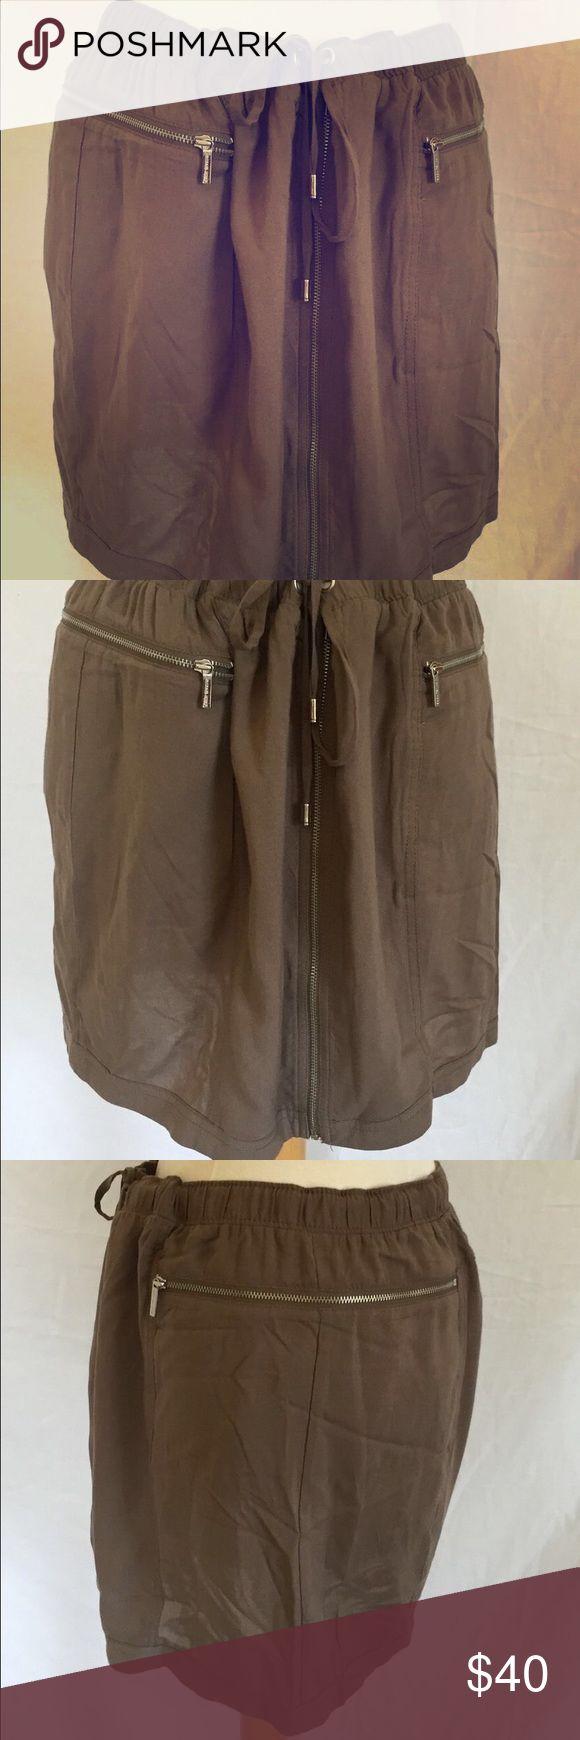 Michael Kors olive green brown zipper front skirt Michael Kors olive green brown zipper front skirt size 10. NWOT. MICHAEL Michael Kors Skirts Mini